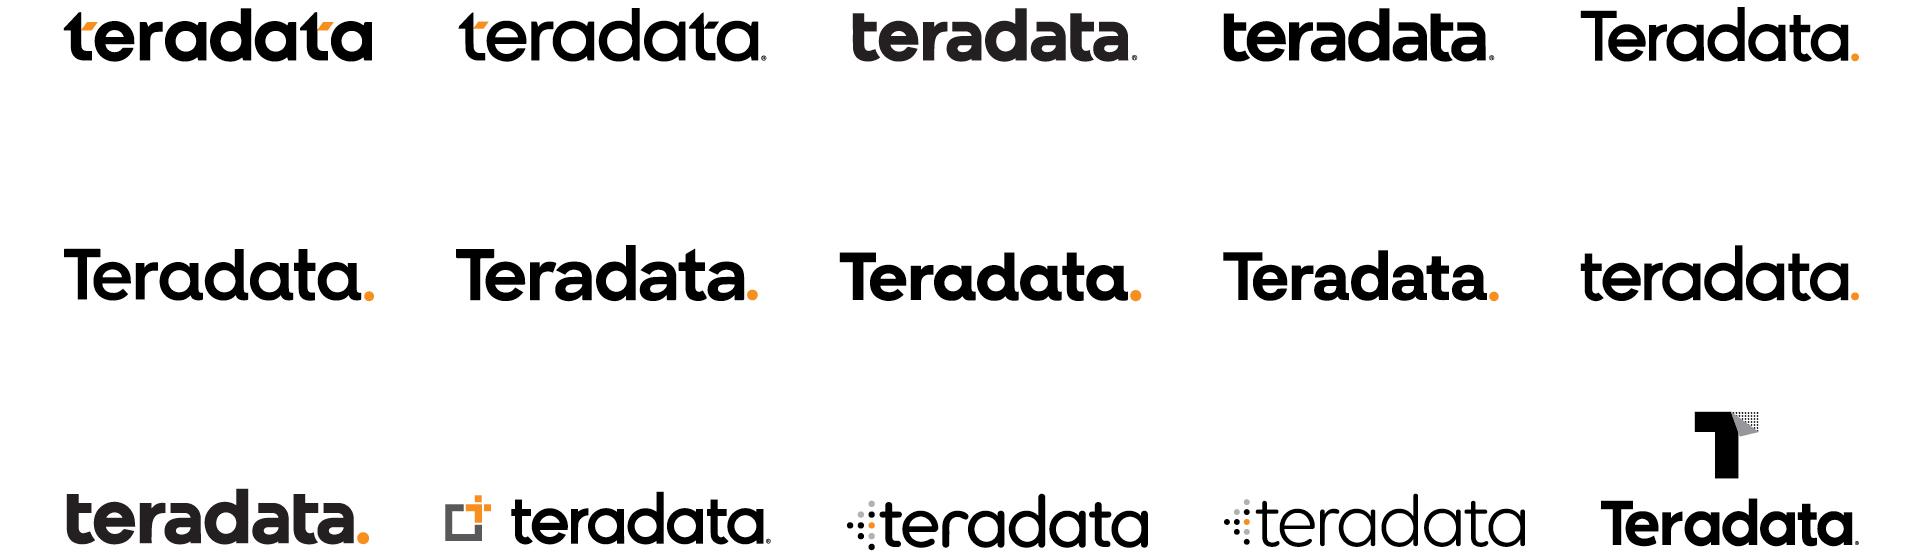 TD_Logo_Portfolio_Pages_v19